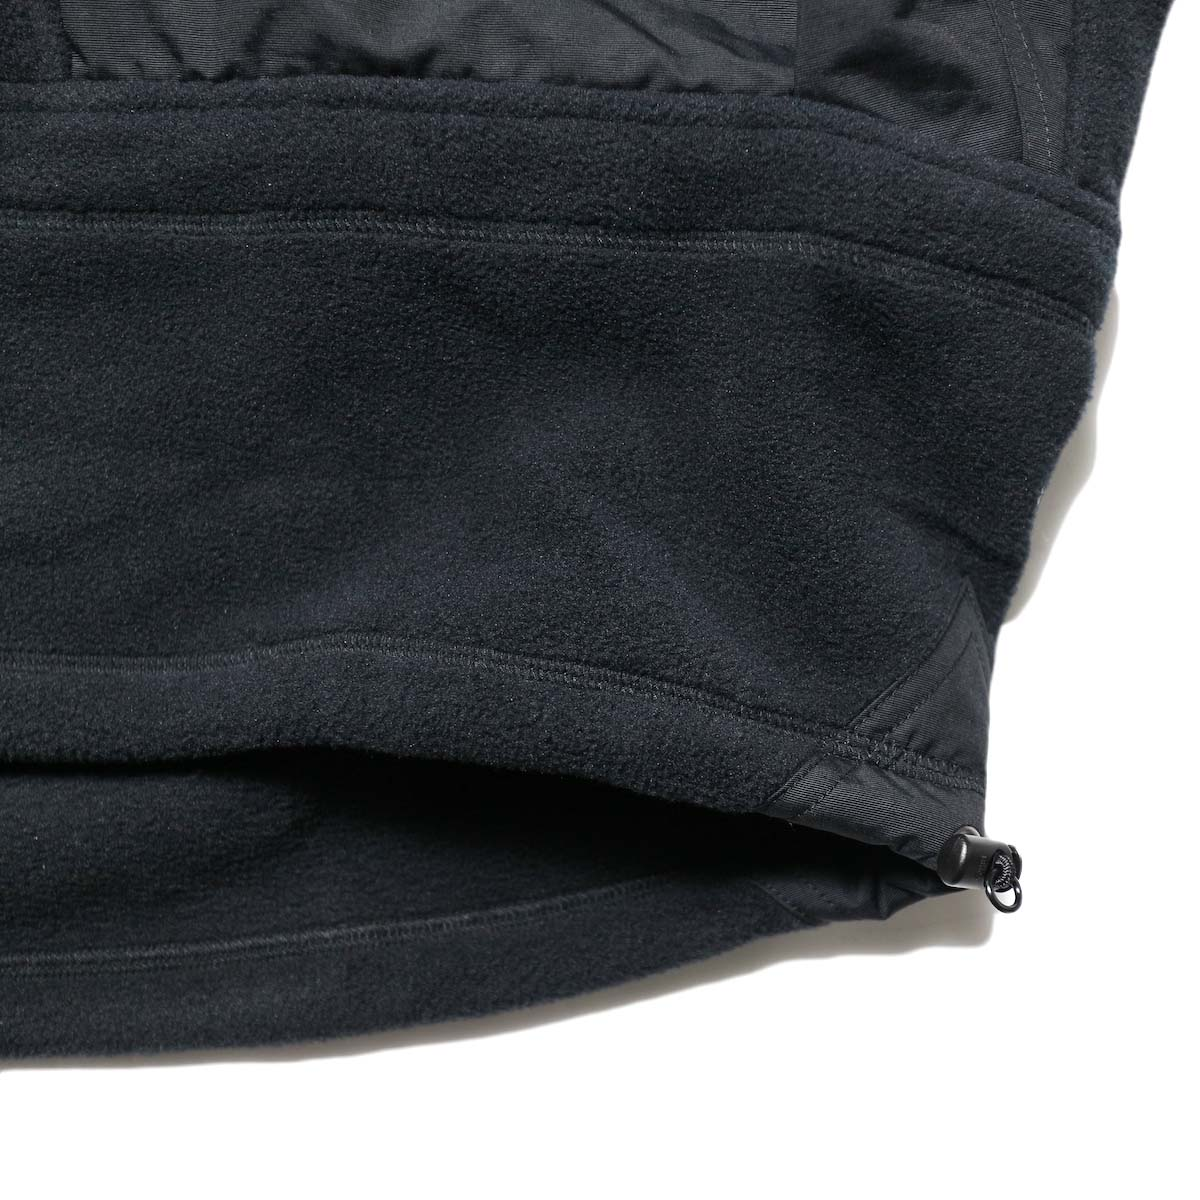 Marmot Histric Collection / Alpinist Tech Sweater (Black×Black)裾スピンドル